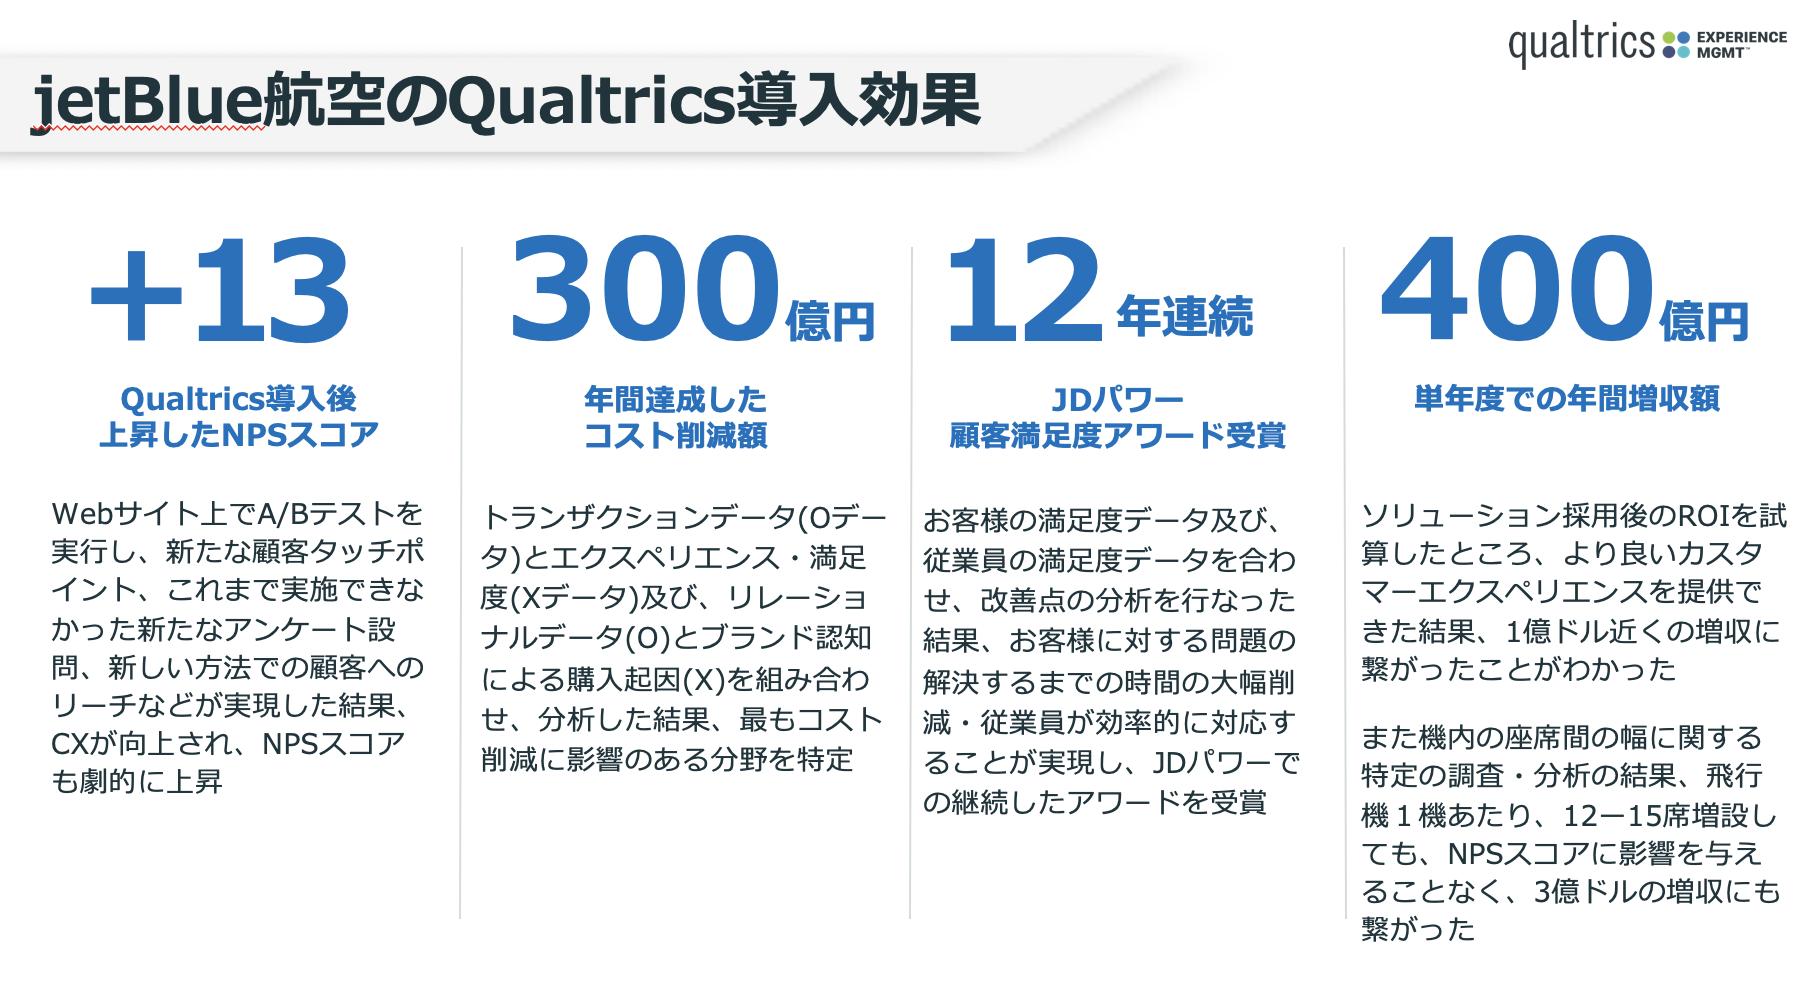 ★jetBlue航空のQualtrics導入効果